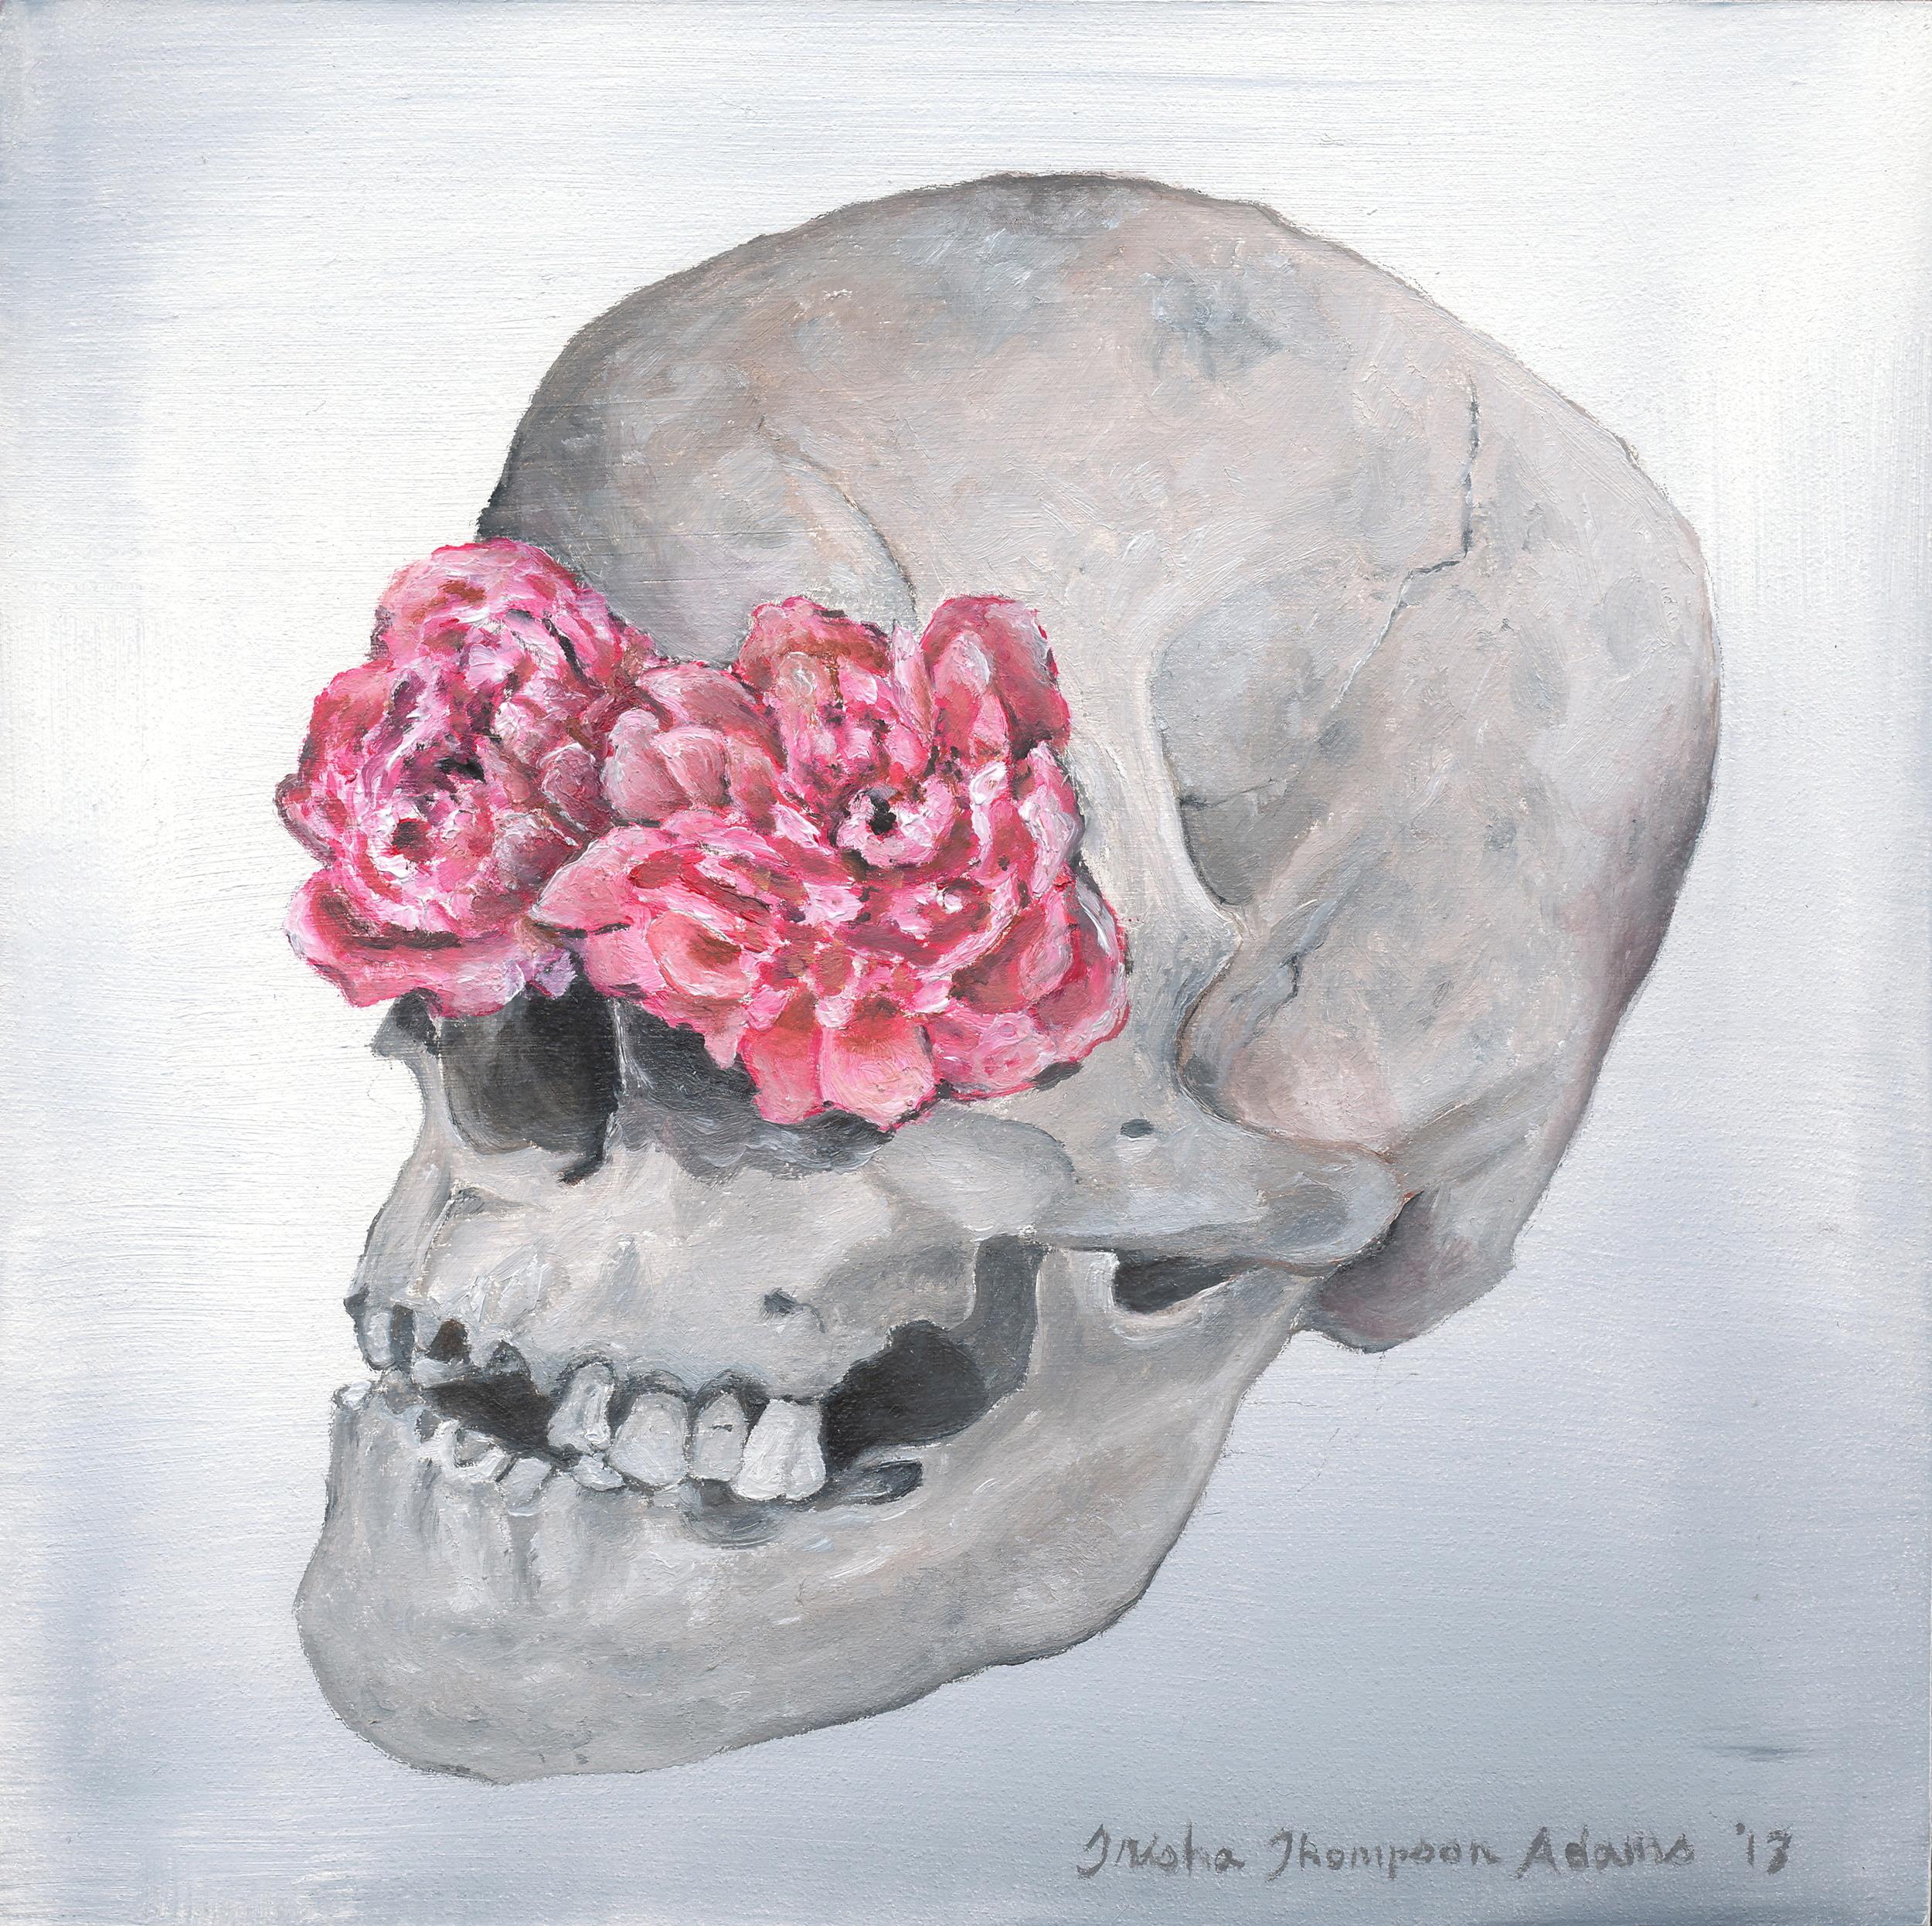 Floral Anatomy: Skull